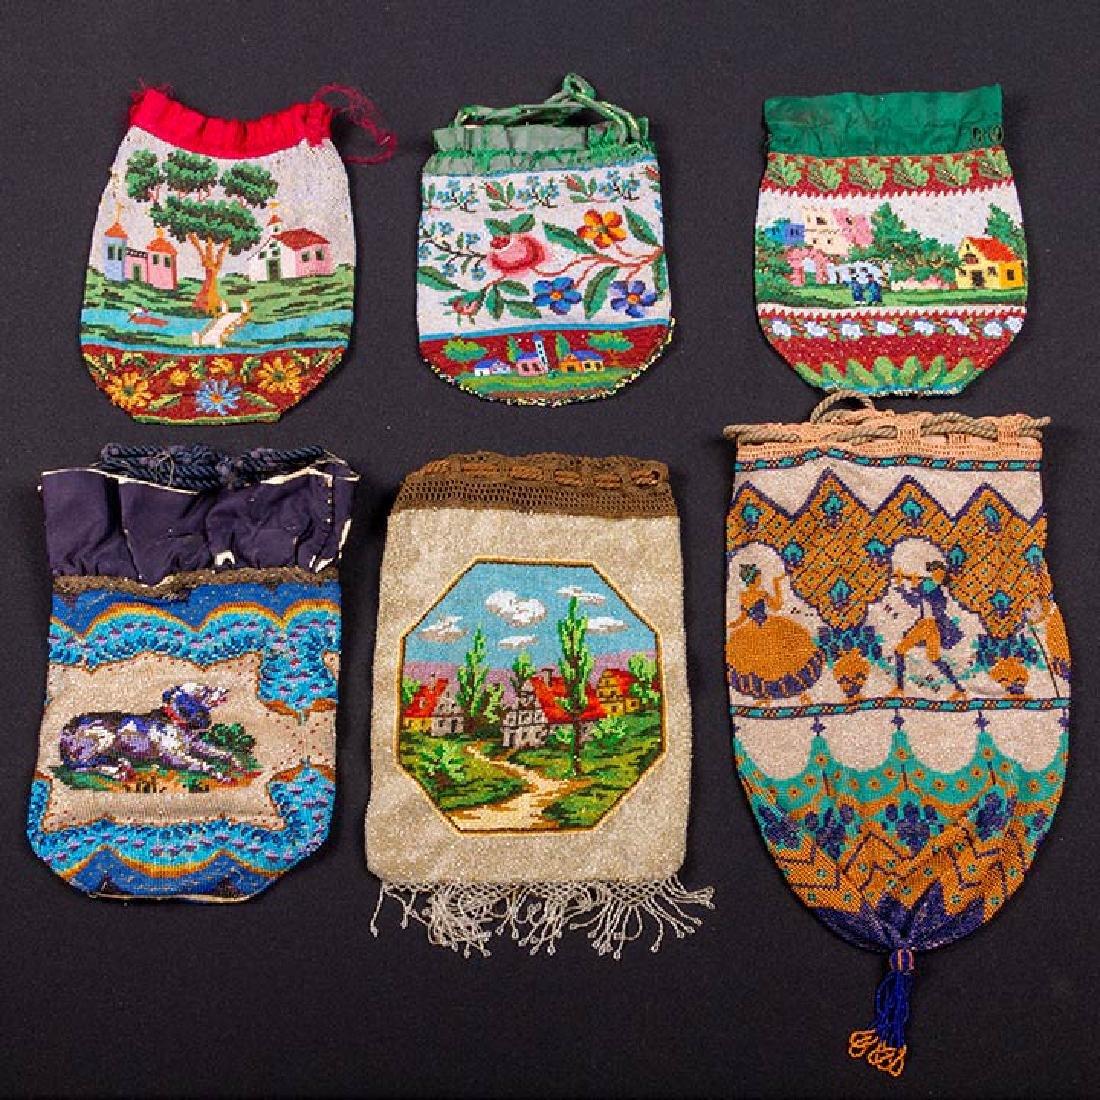 6 PICTORIAL BEADED BAGS, 1840-1900